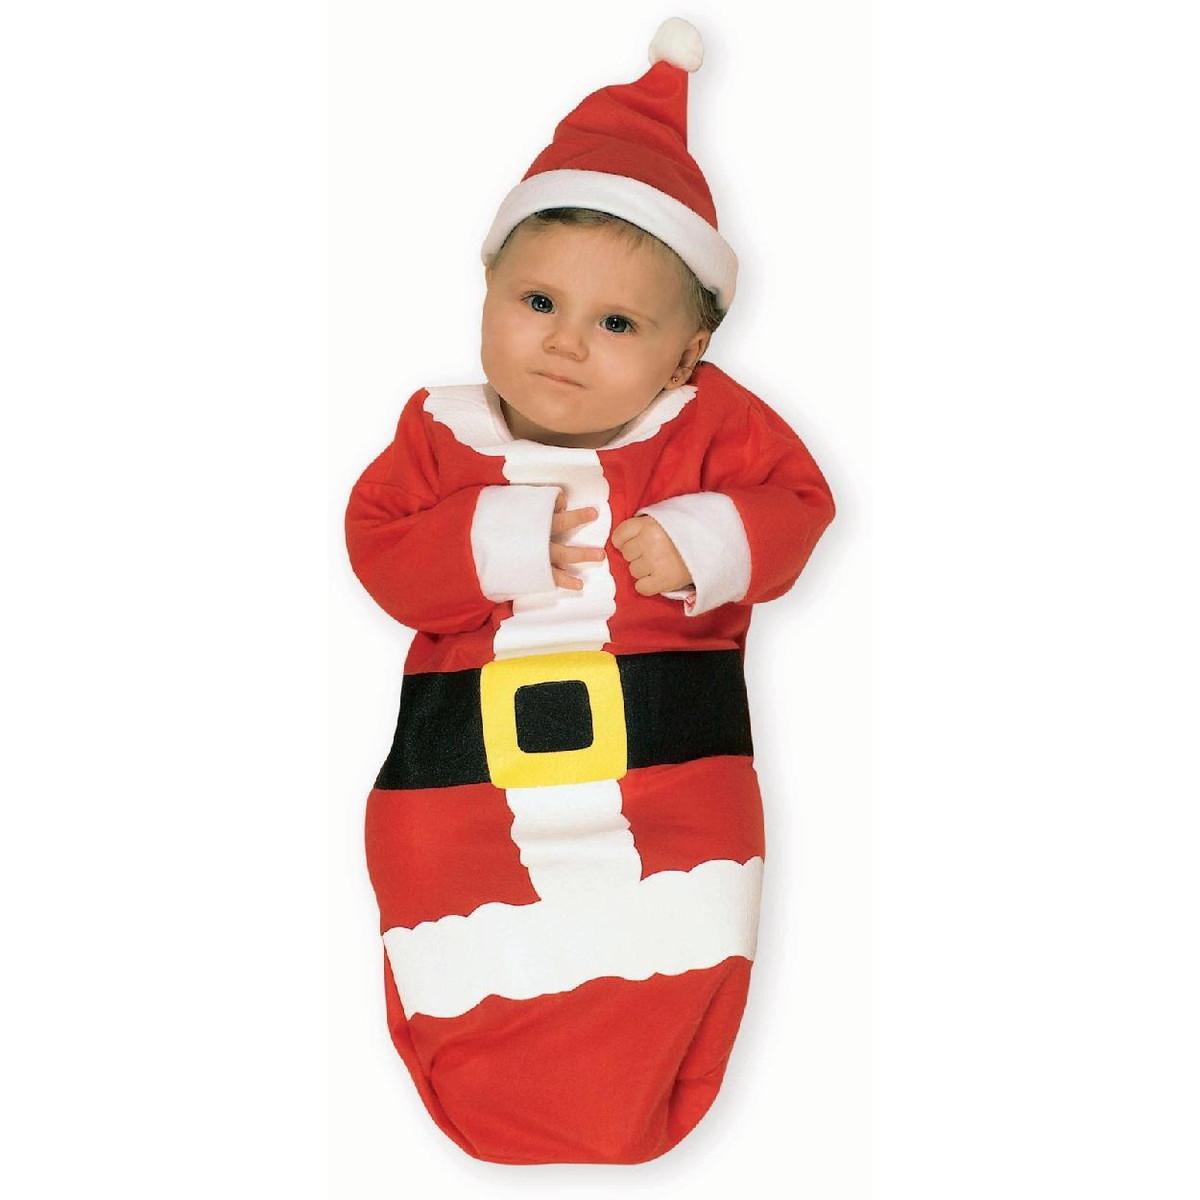 Swaddle baby costume Santa Santa cosplay baby Santa Claus cosplay outfit Rakuten Japan one sale item  sc 1 st  Rakuten & acomes | Rakuten Global Market: Swaddle baby costume Santa Santa ...